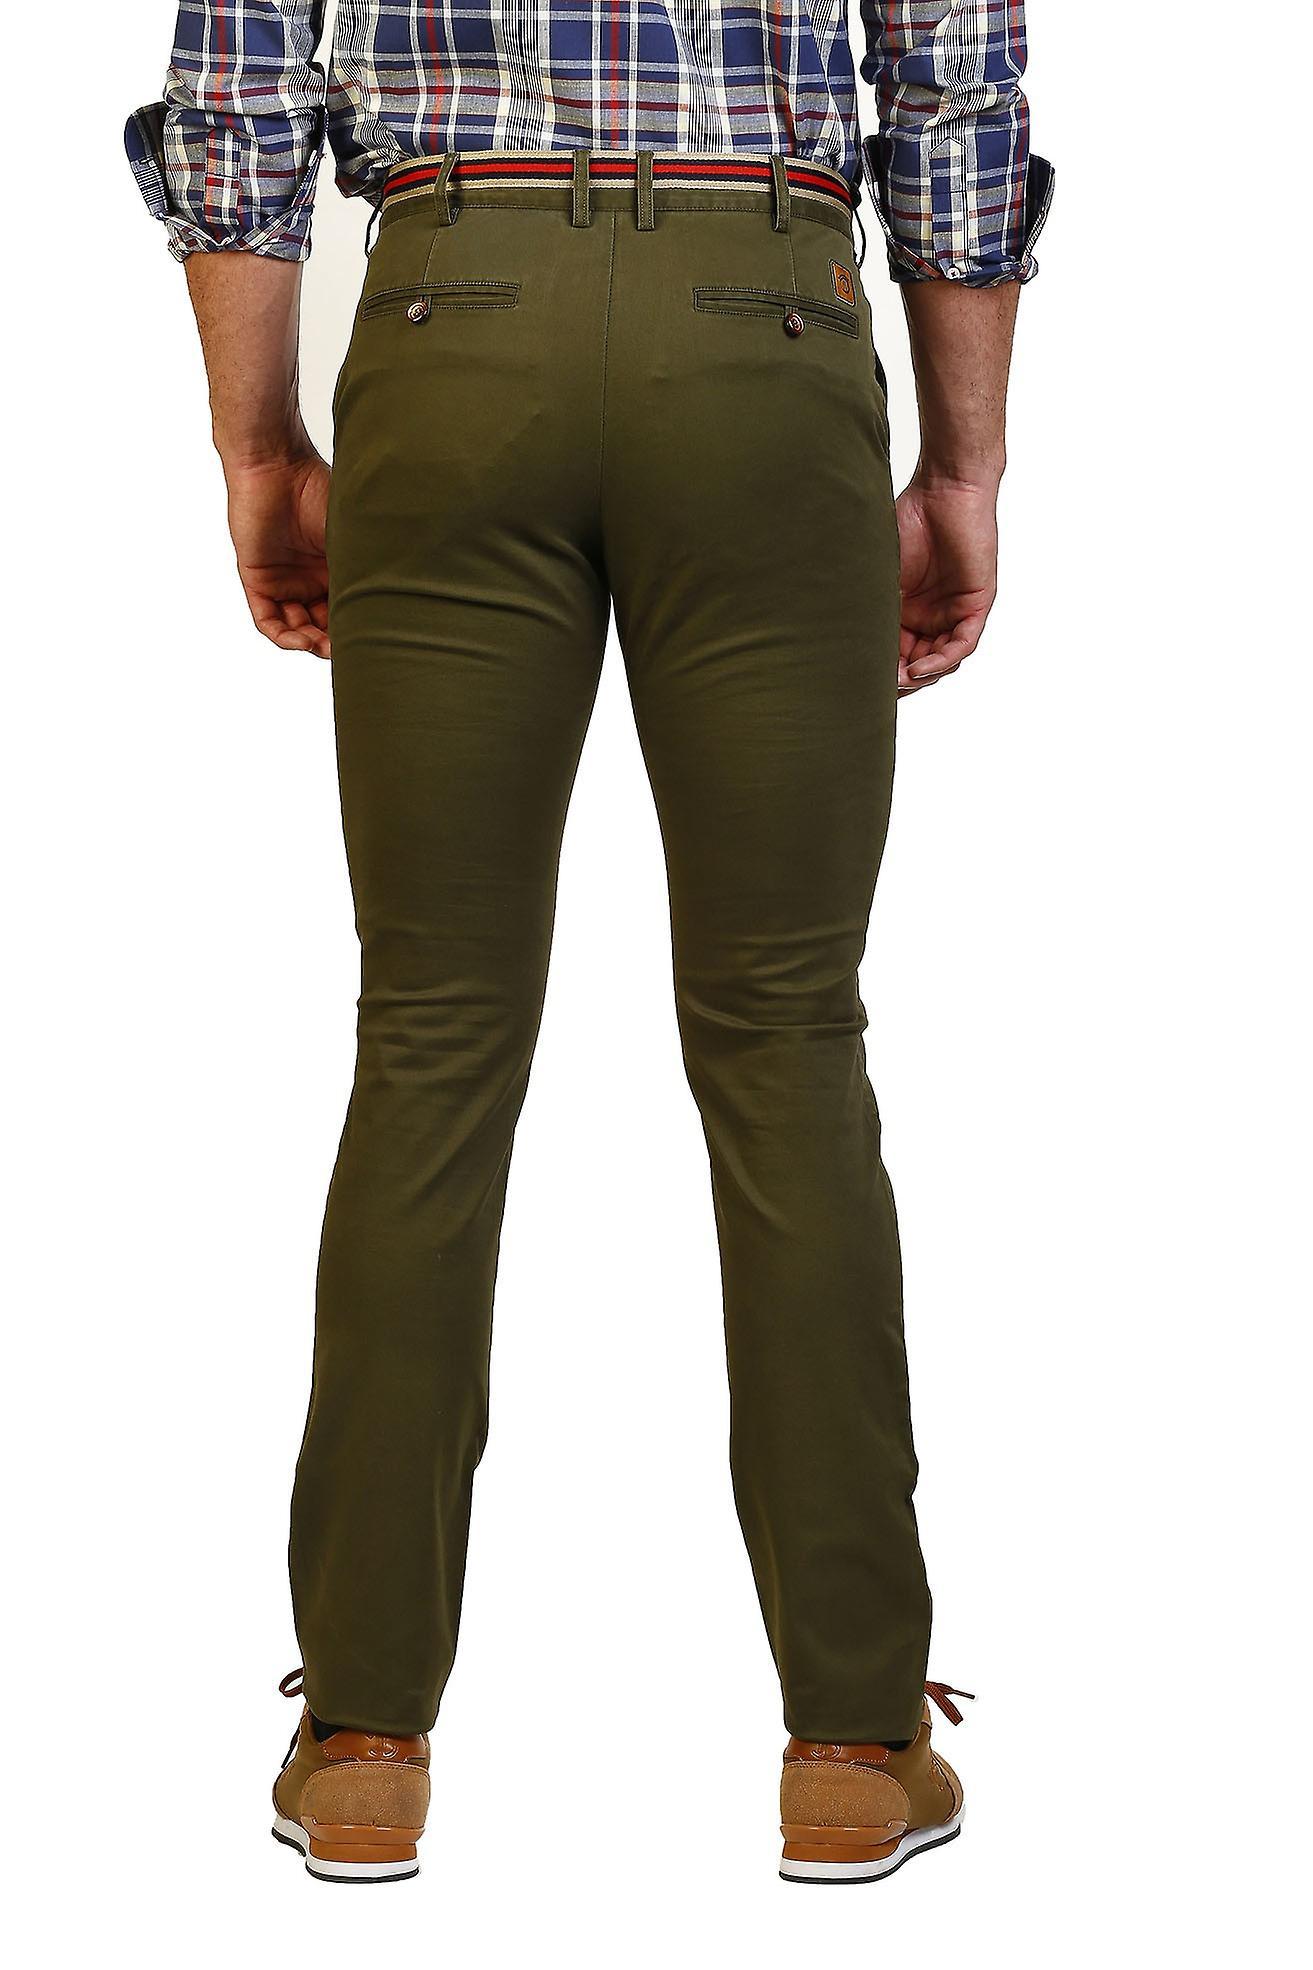 Pantalon Hombre The Time Of Bocha JI1PPOLO-192-Verde 715